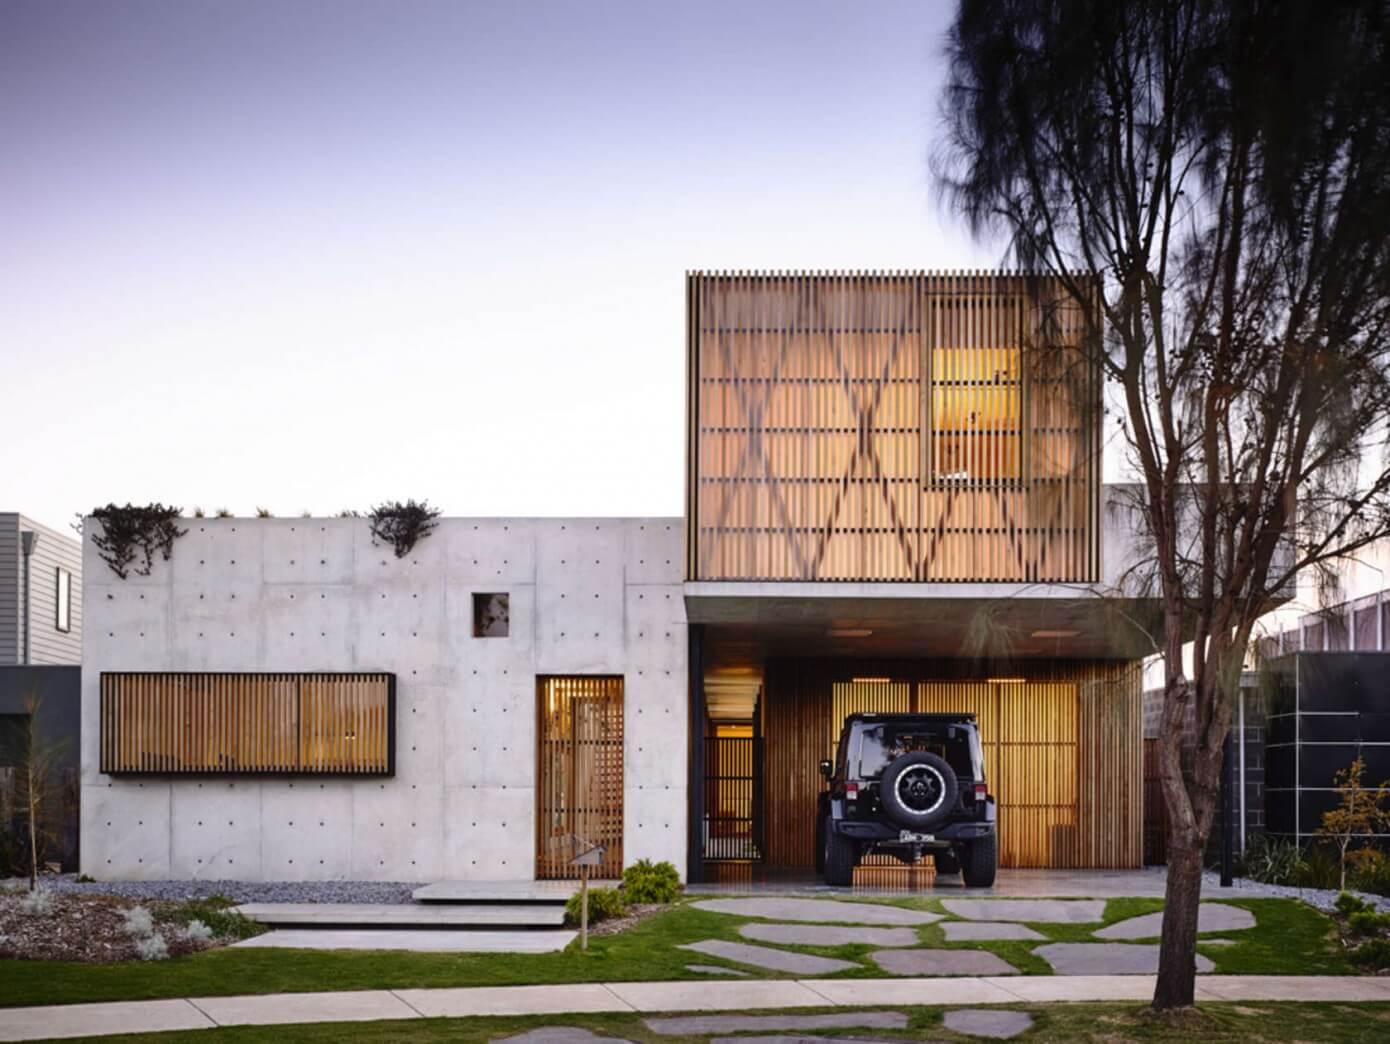 Beautiful Concrete Buildings : Torquay concrete house by auhaus architecture « homeadore